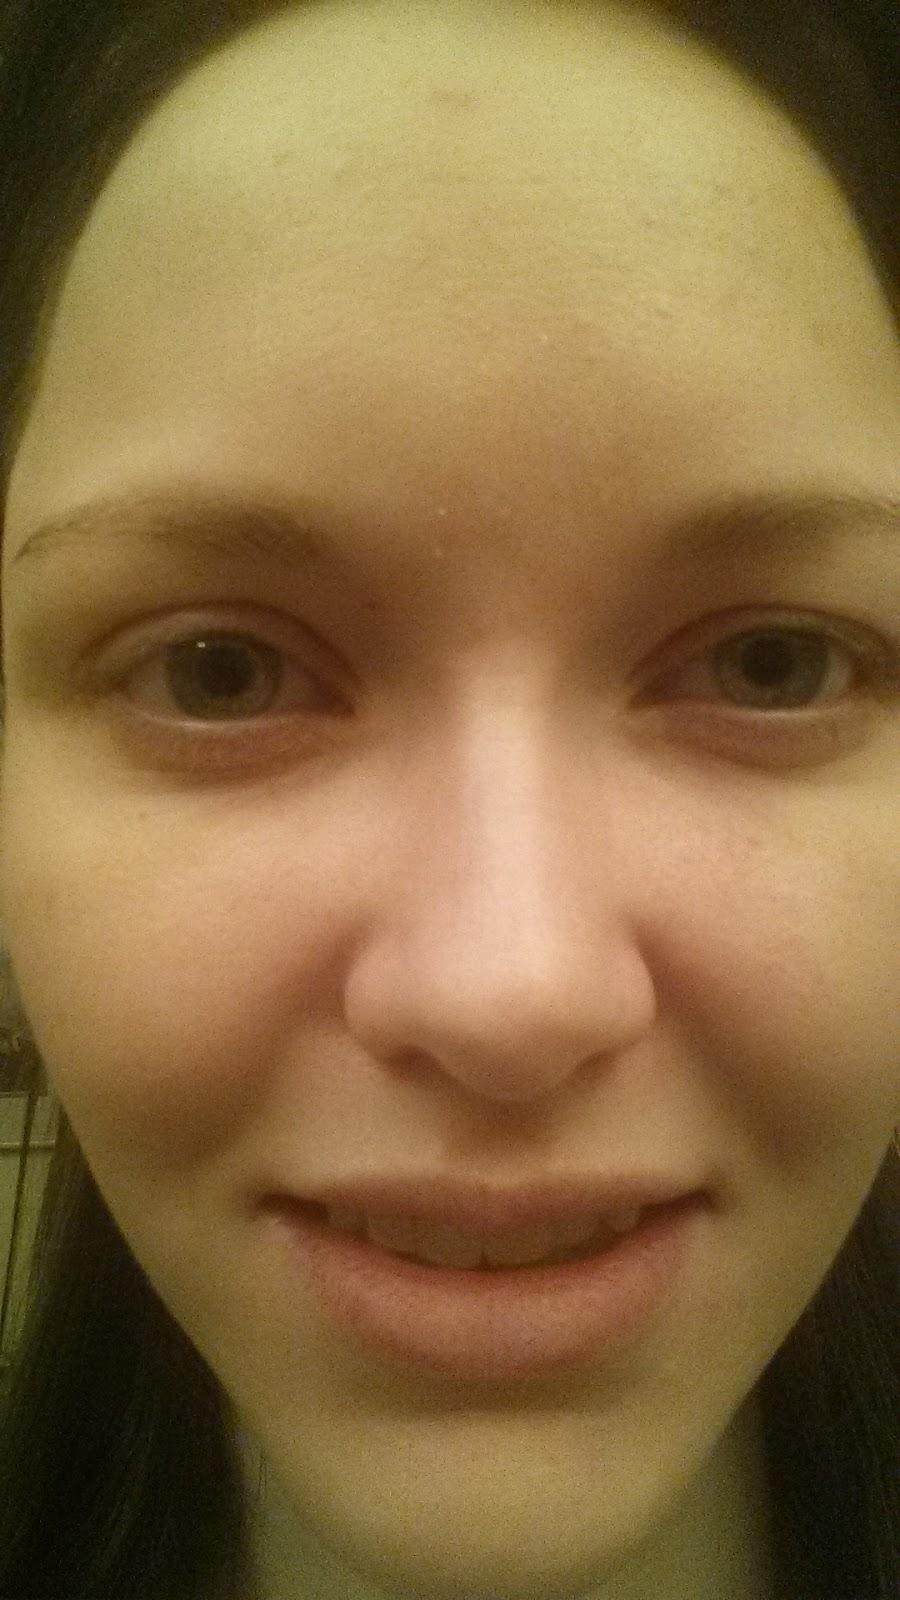 BERNICE: Chronic facial pain and swelling